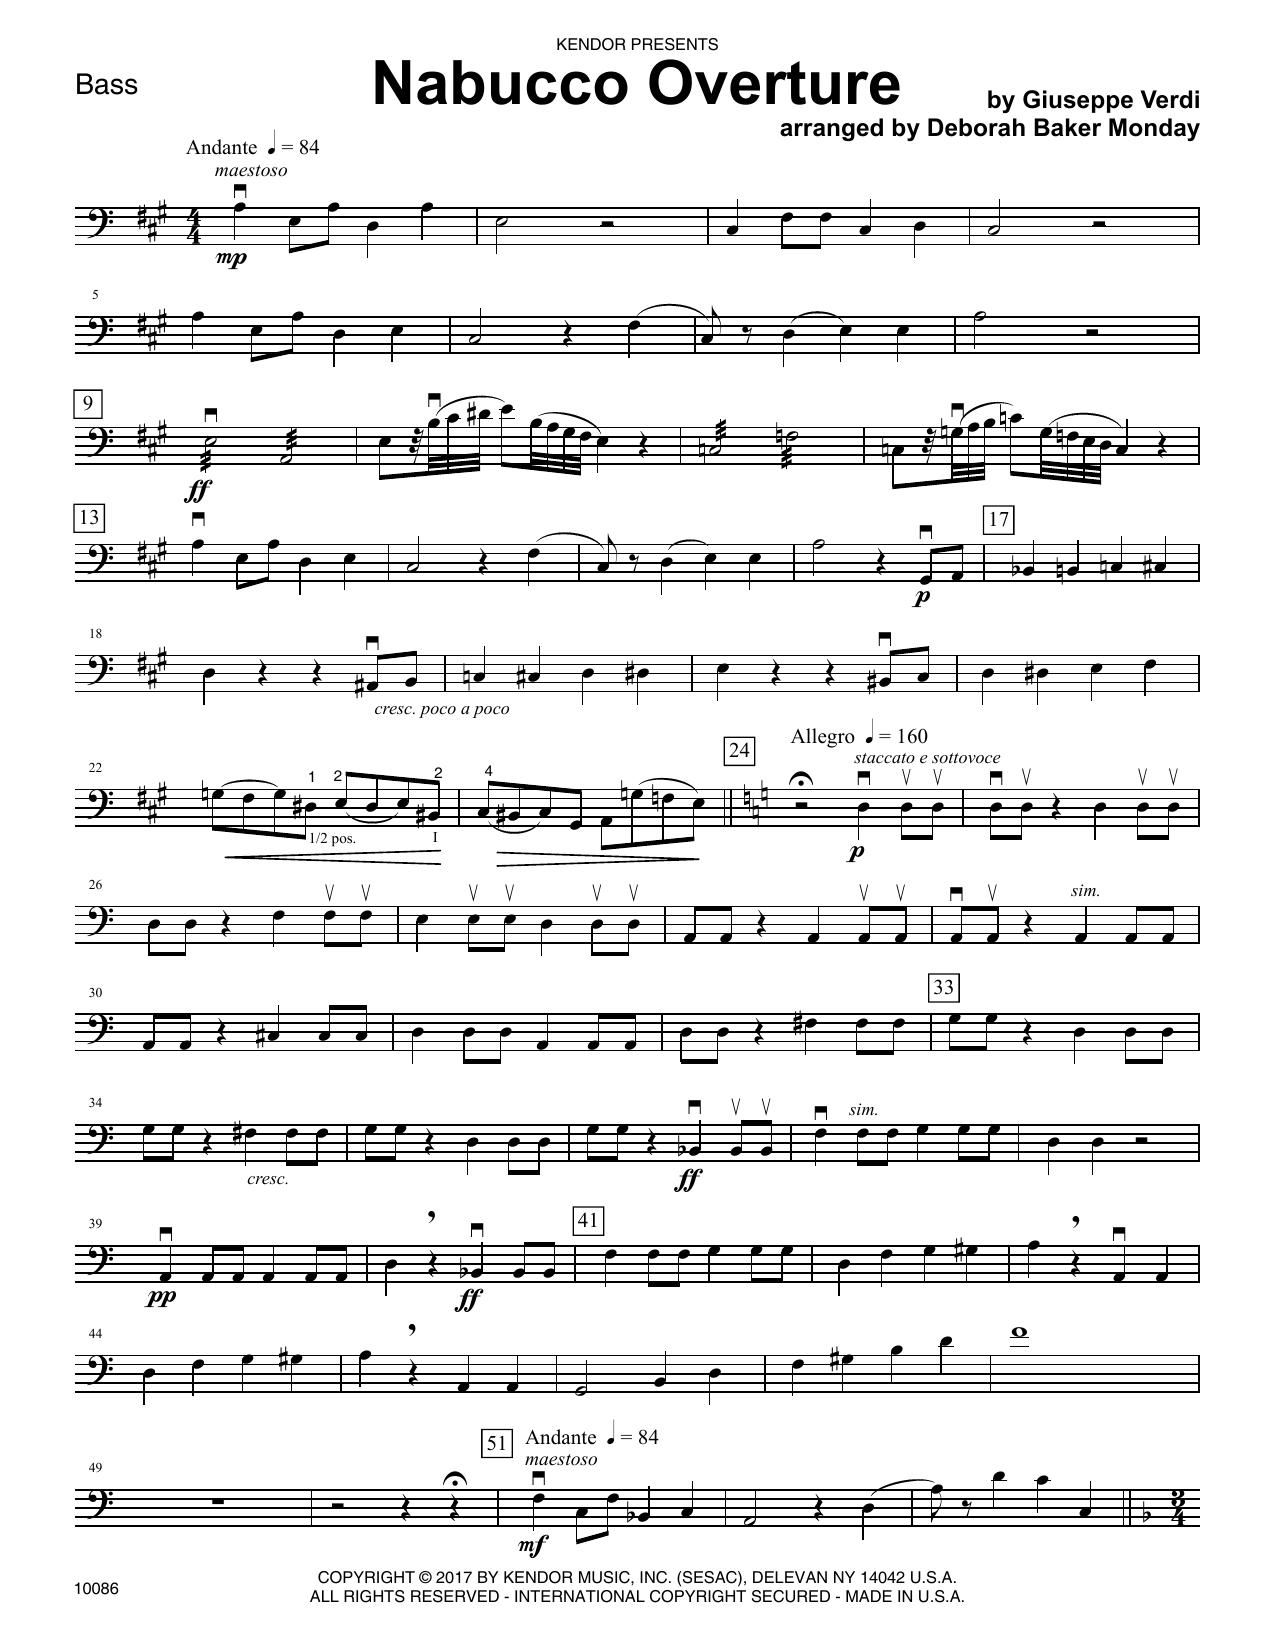 Nabucco Overture - Bass